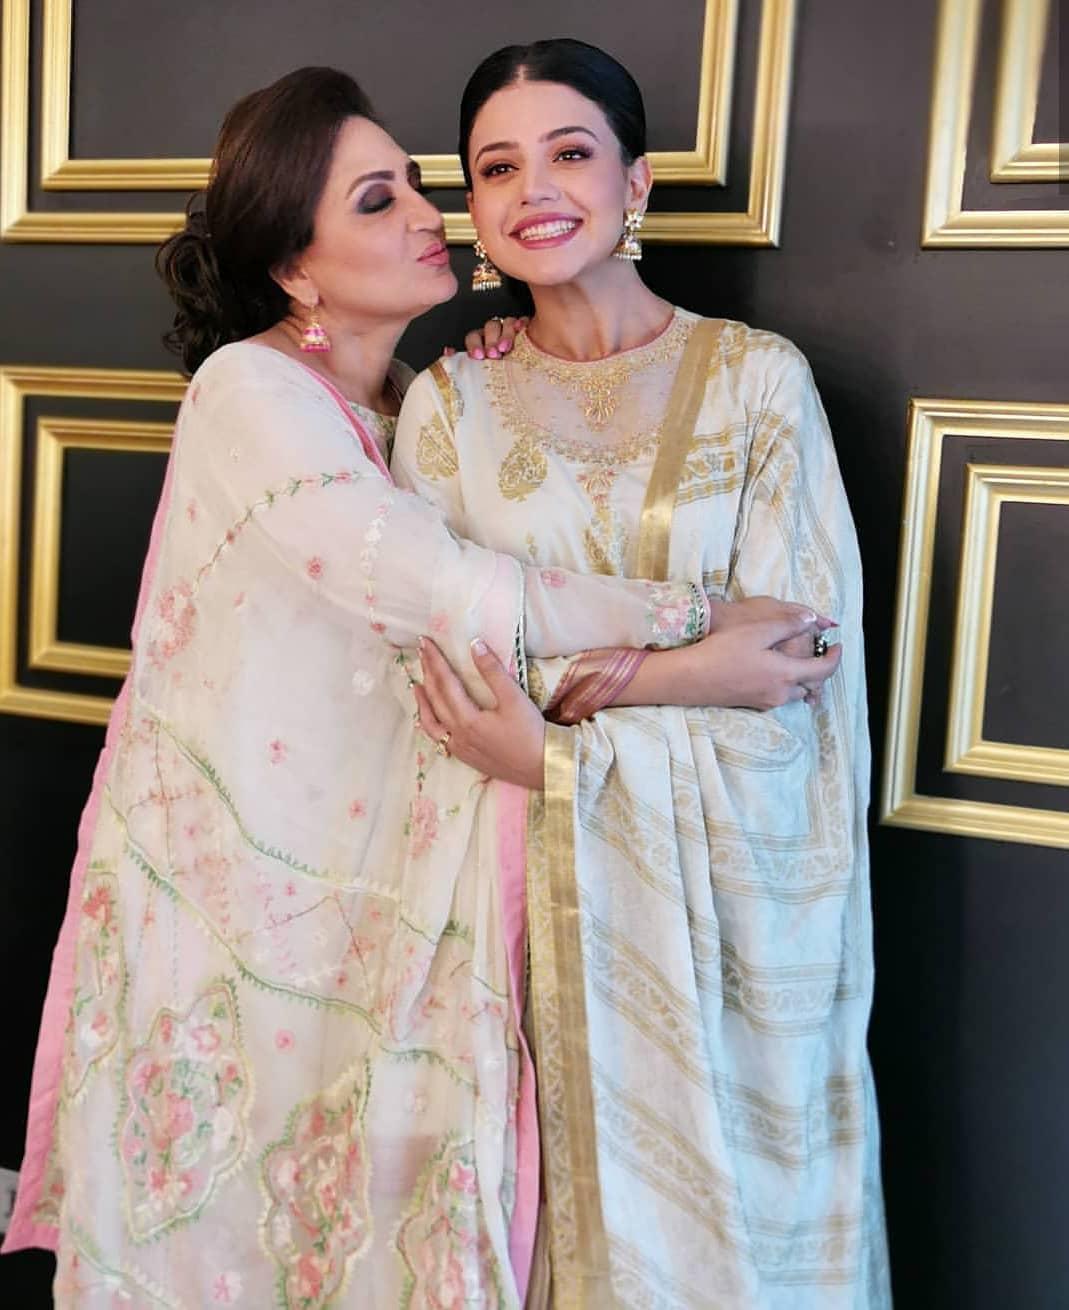 Beautiful Photoshoot of Actress Zara Noor Abbas with her Mother Asma Abbas